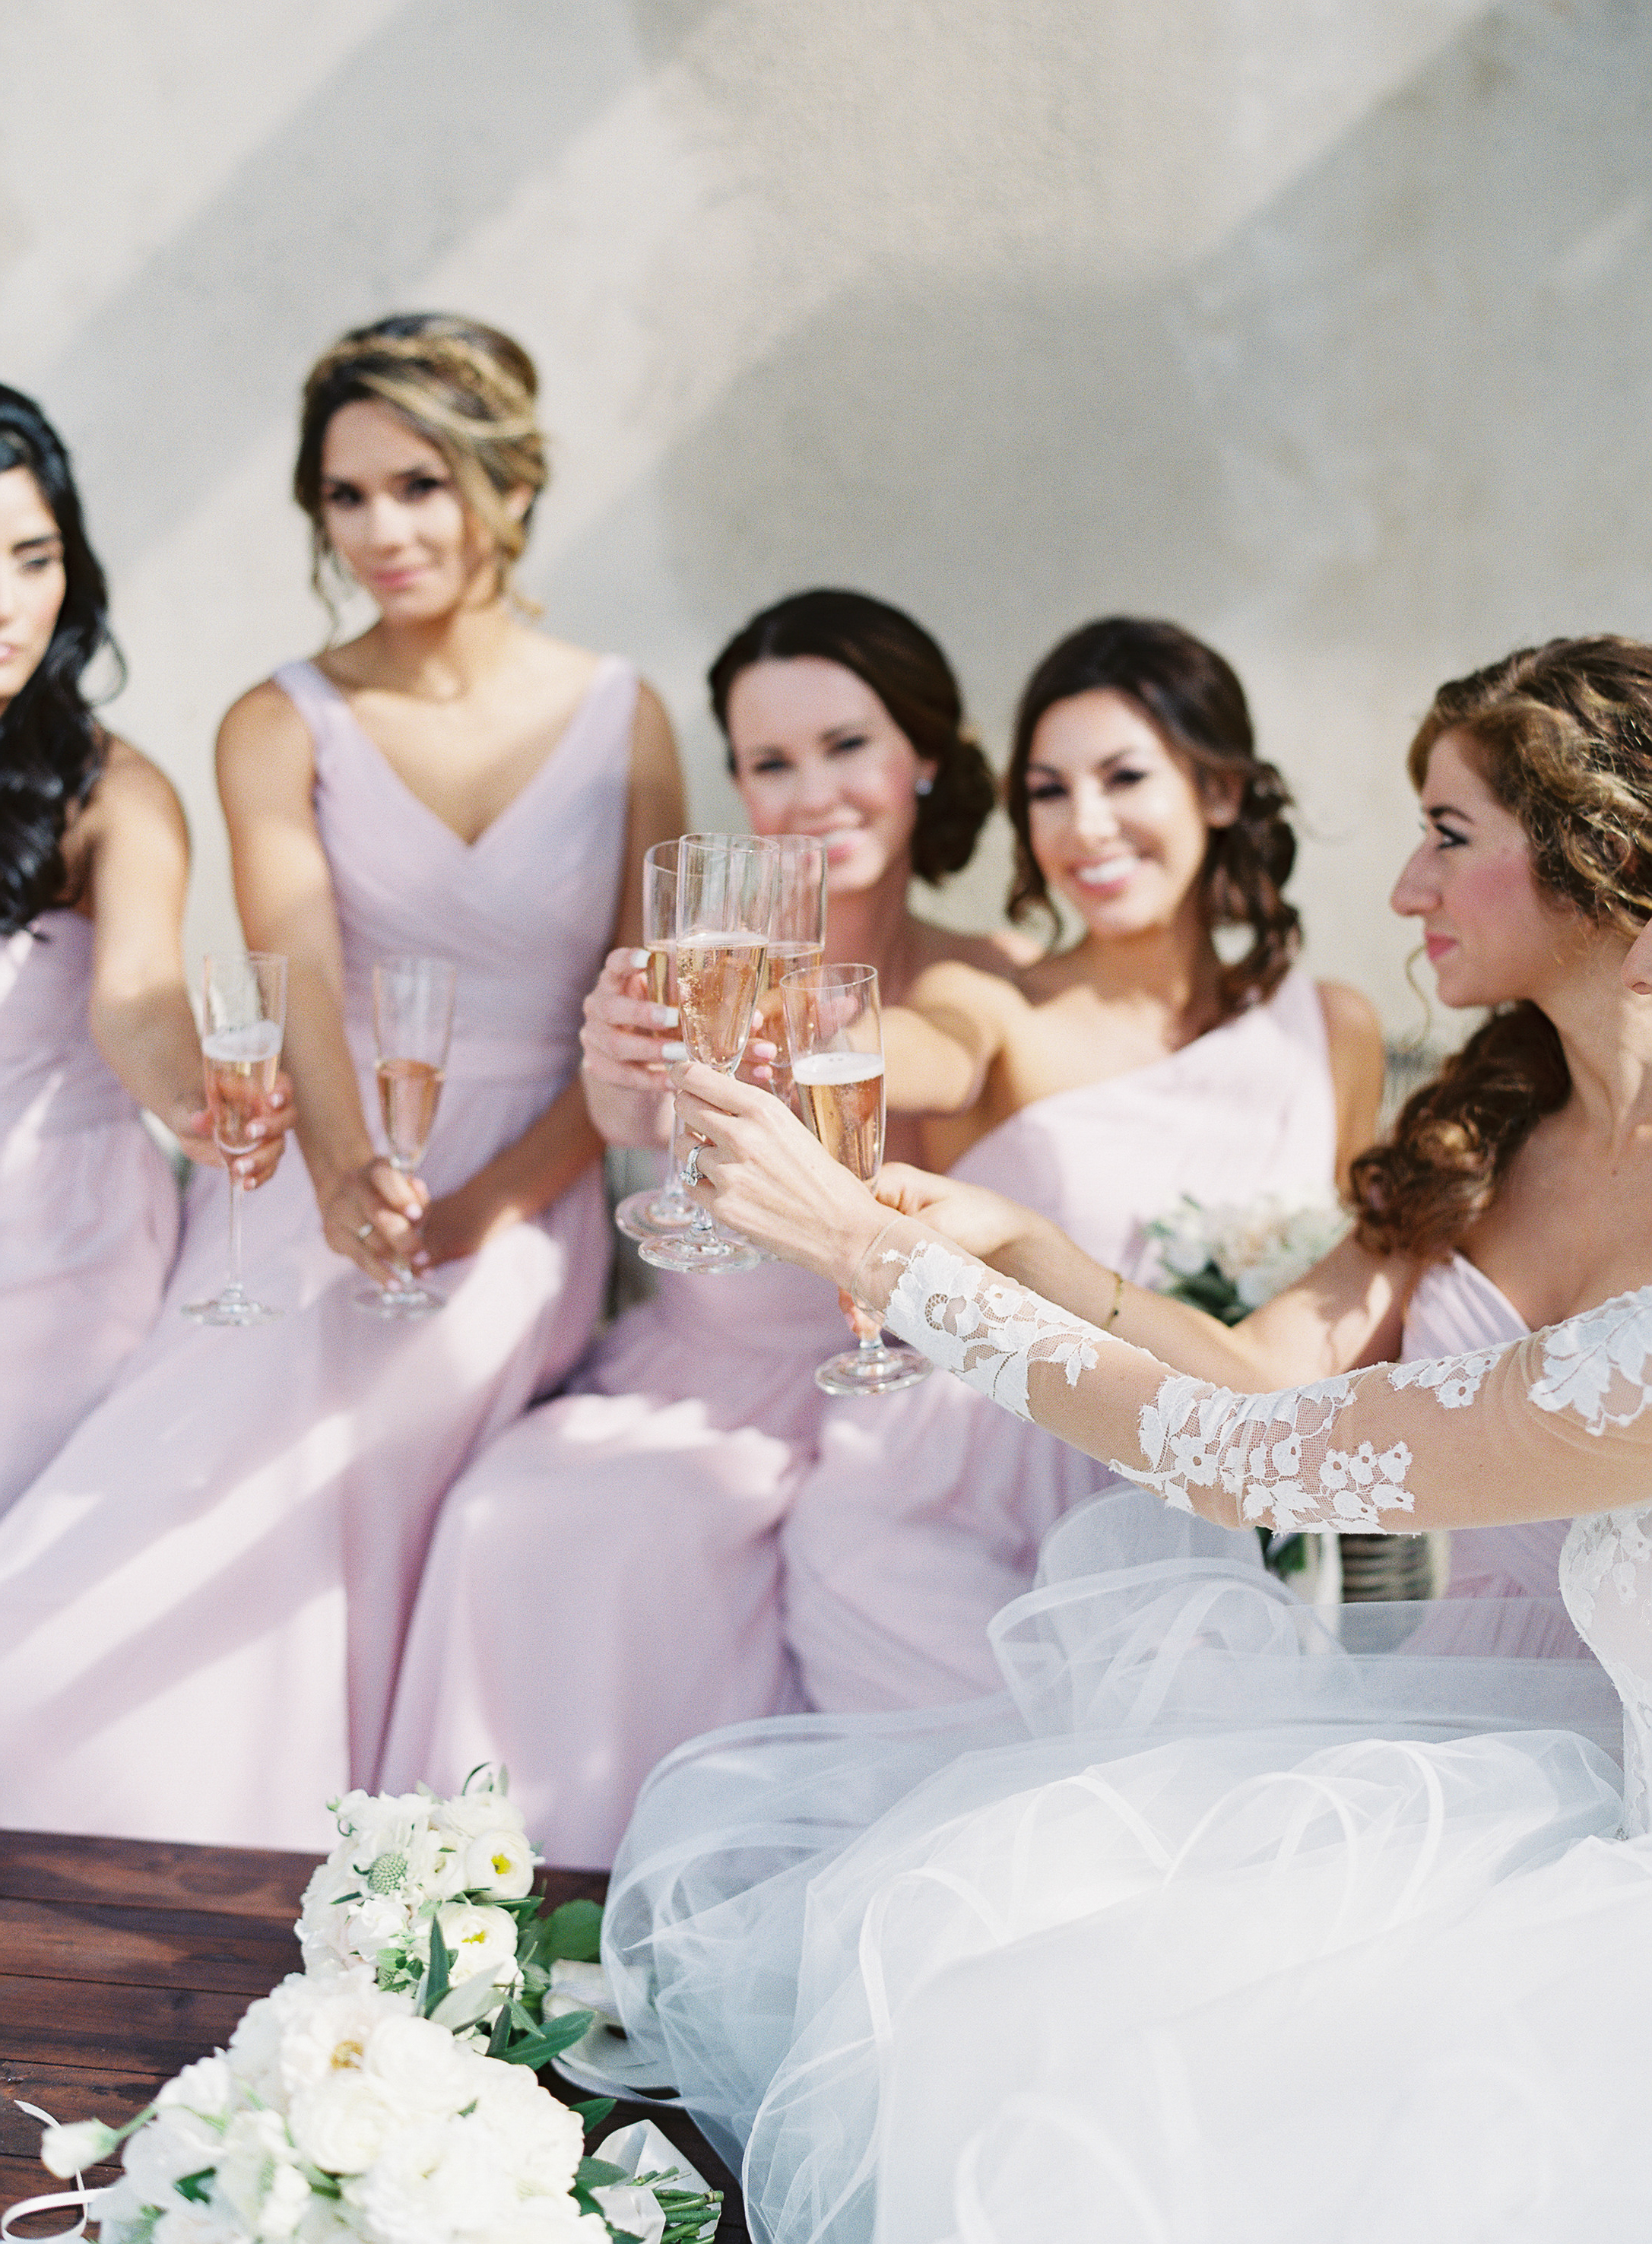 Meghan Mehan Photography   Fine Art Film Wedding Photographer   California   San Francisco   Napa   Sonoma   Santa Barbara   Big Sur   Destination Wedding Photographer 018.jpg